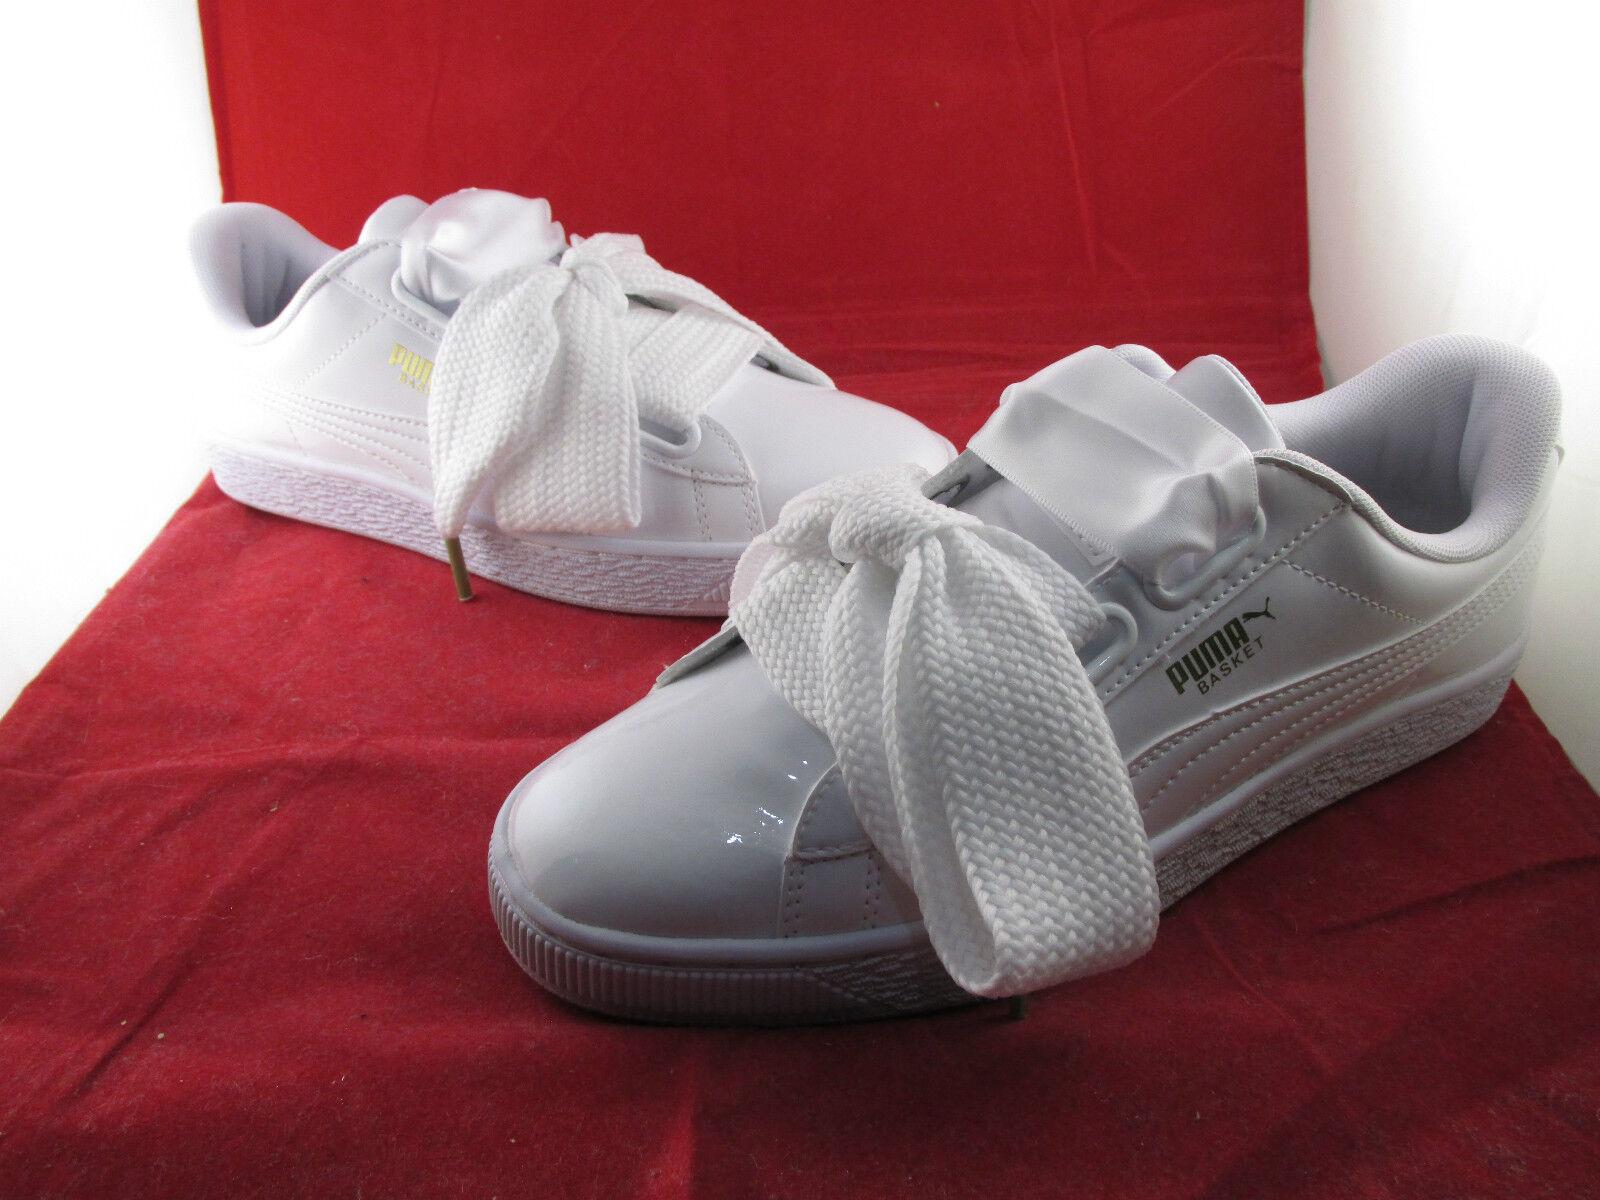 Puma Basket Heart Patent Woman White 3 4 5 6 All Sizes 363073-02 SportsLocker